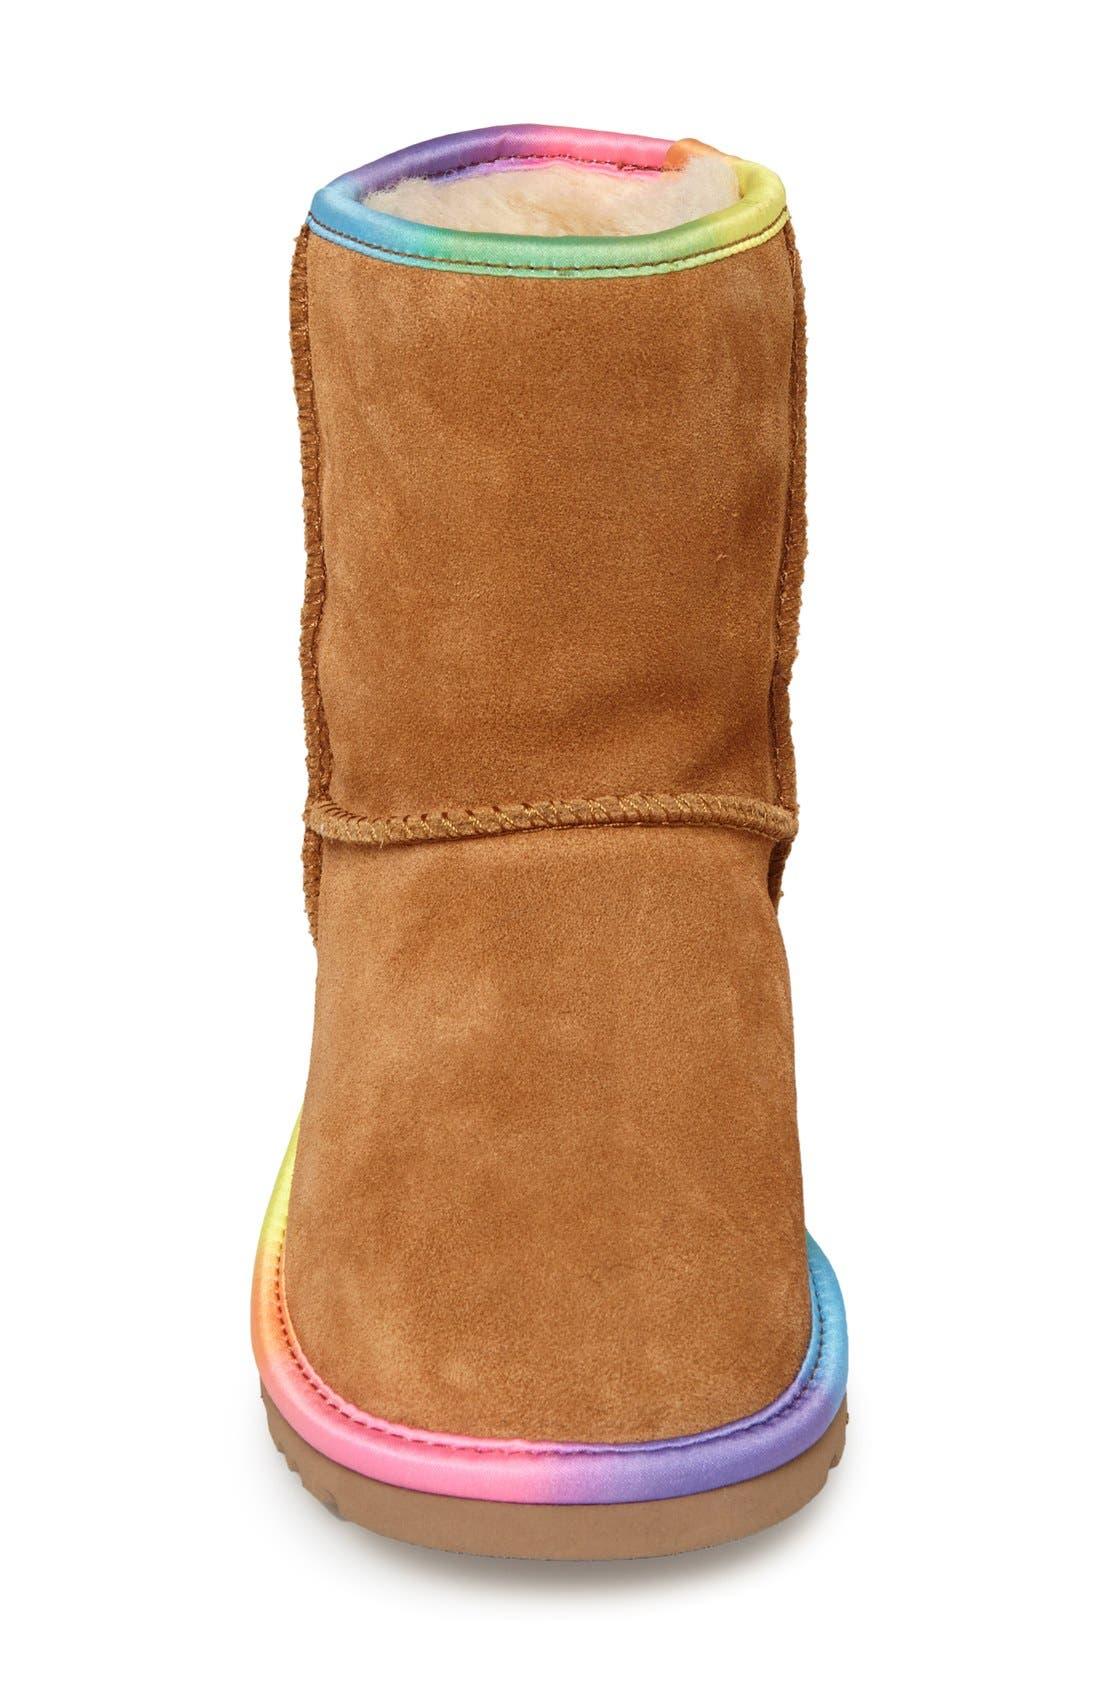 Australia 'Classic Short' Rainbow Boot,                             Alternate thumbnail 3, color,                             219